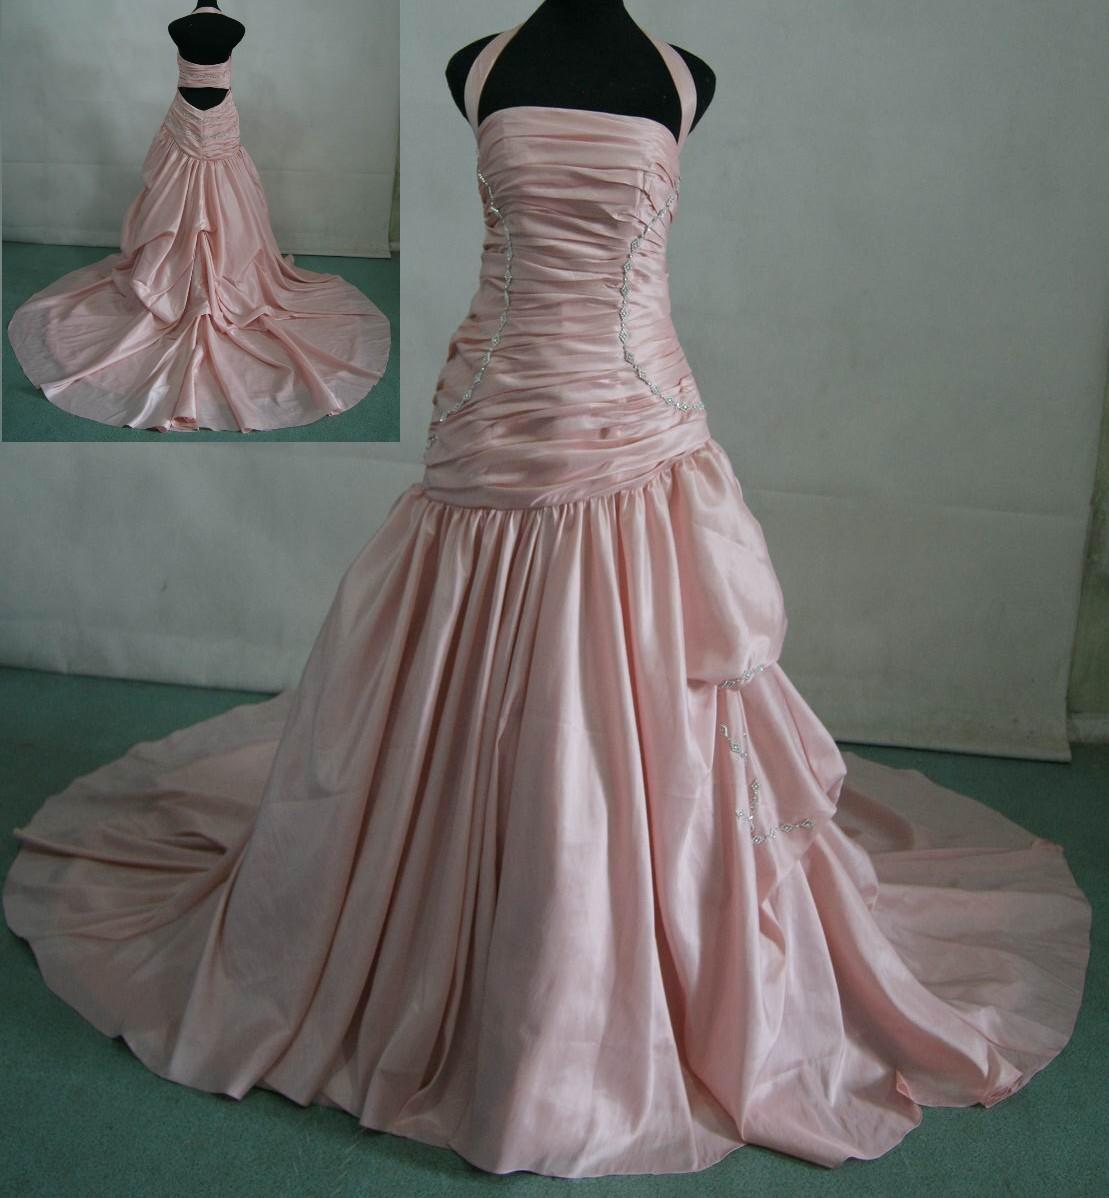 dream wedding dresses light pink wedding dress White sheath halter wedding dress Pink Taffeta Halter Wedding Dress